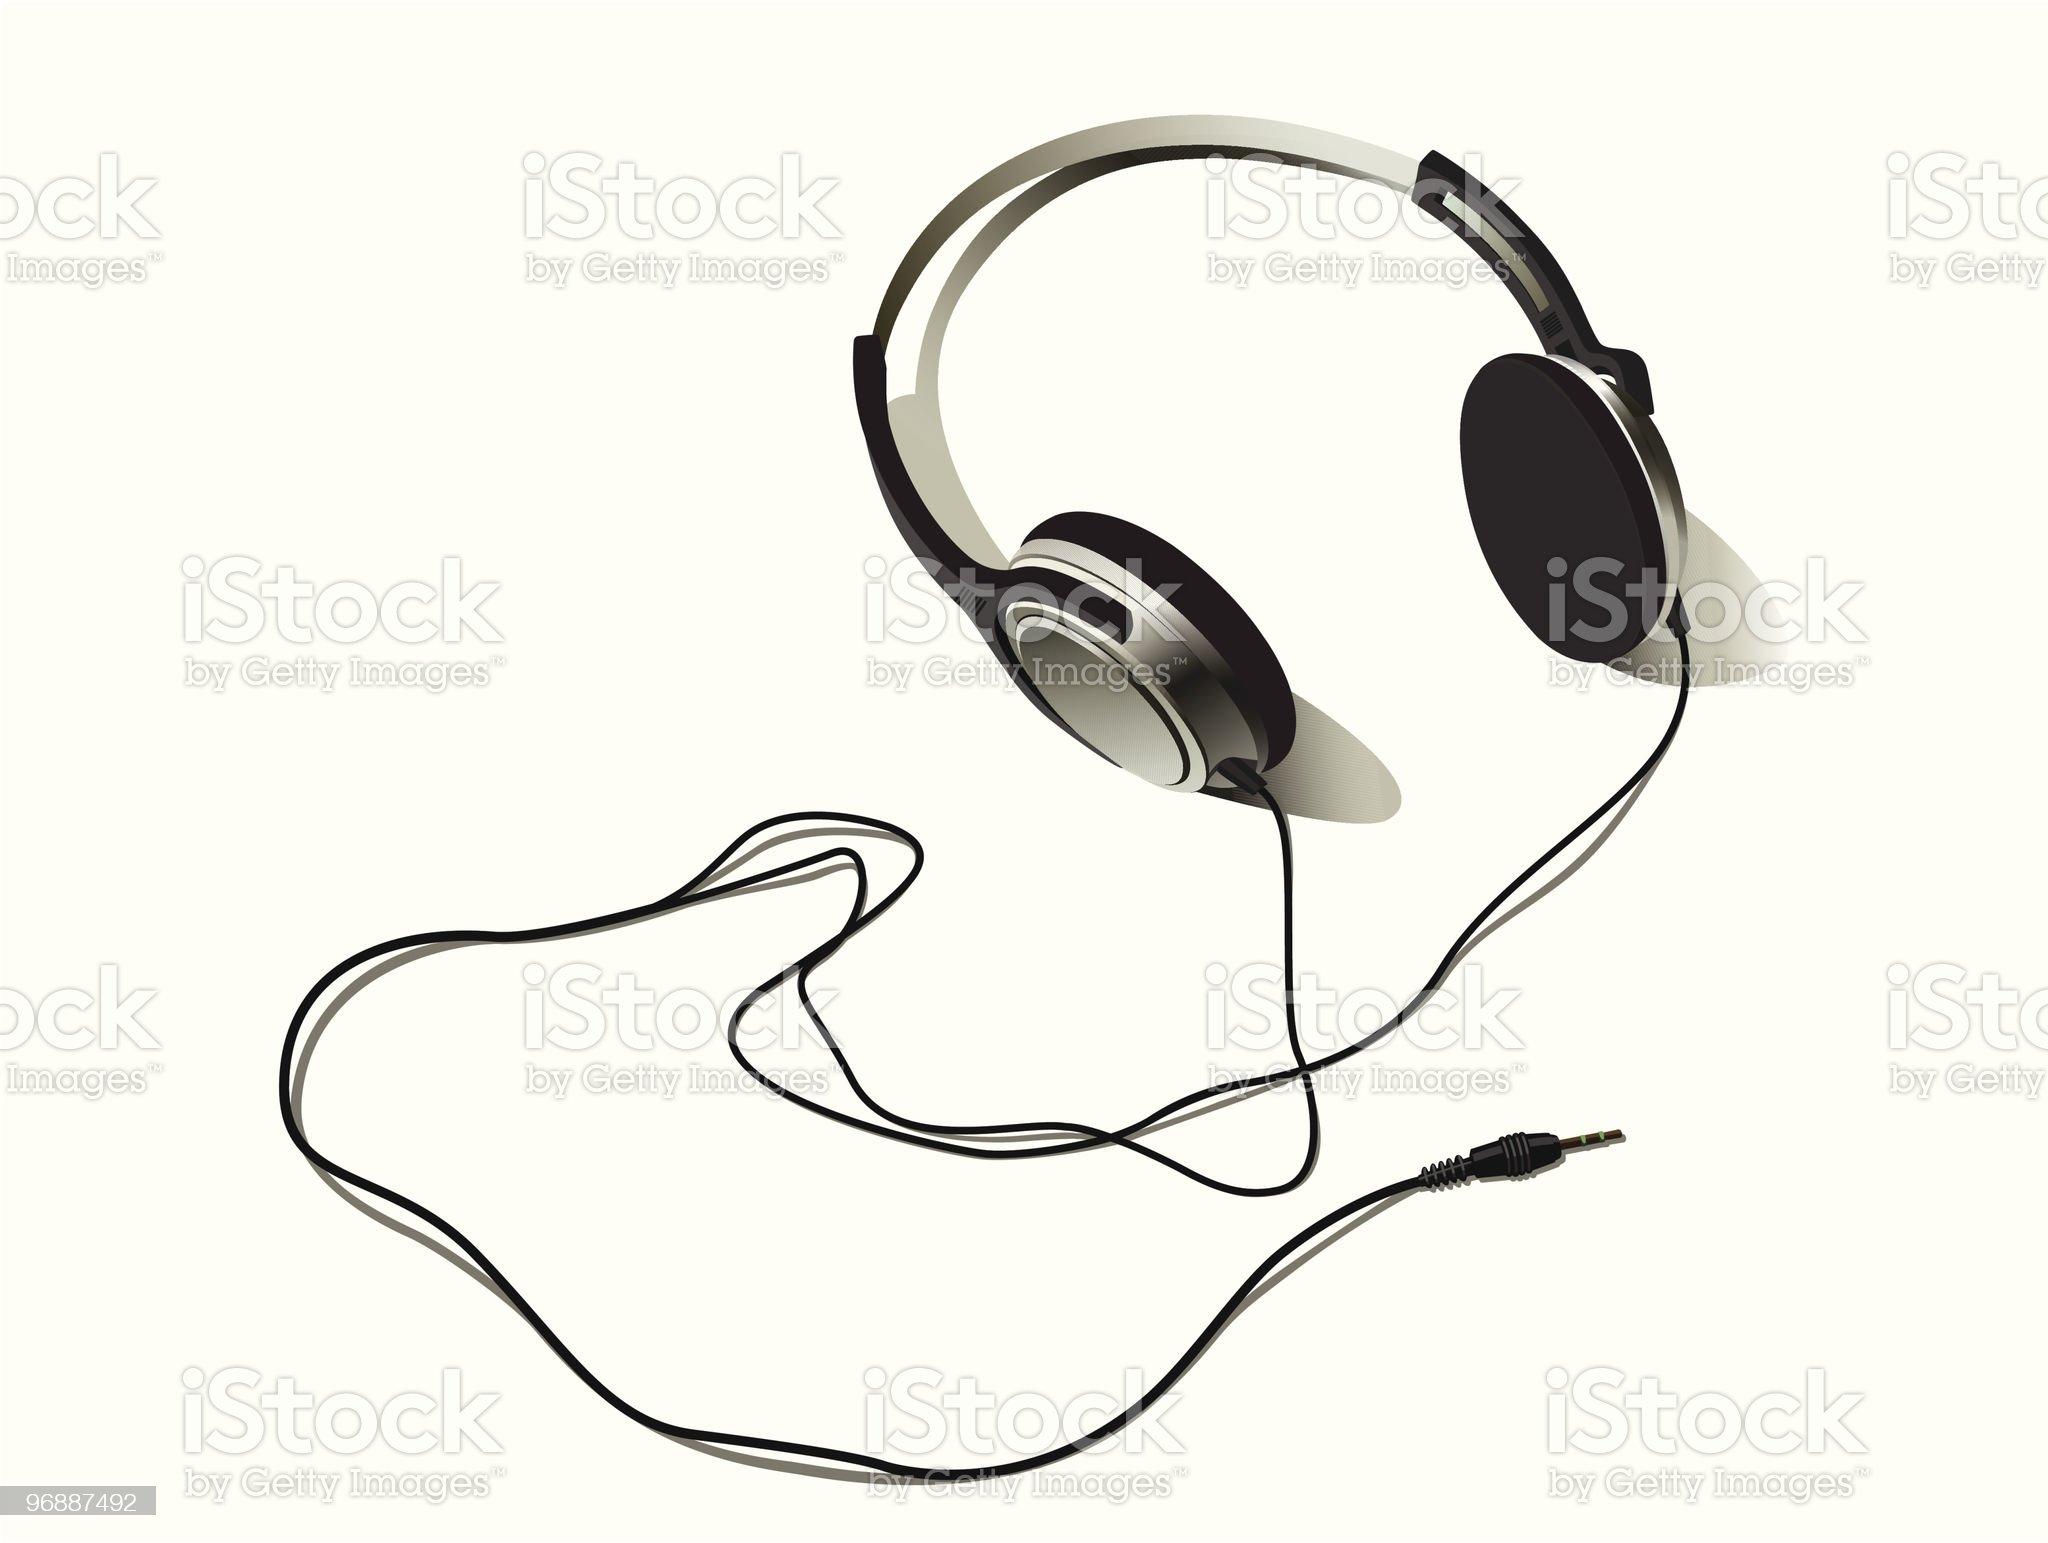 vector illustration of headphones royalty-free stock vector art